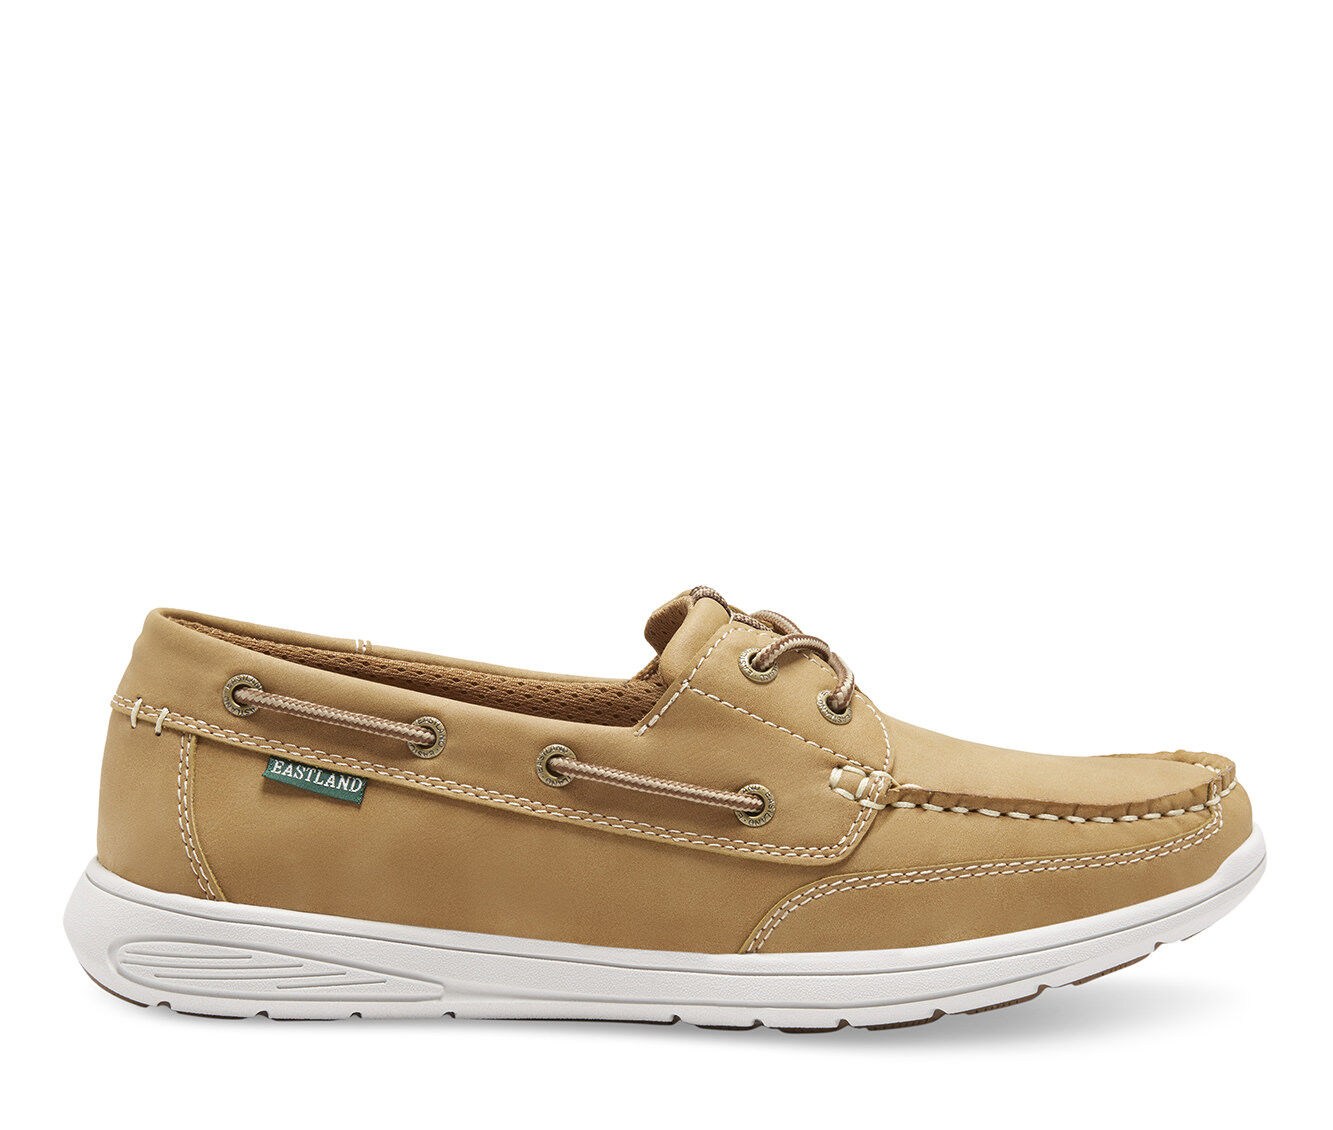 cheapest new Men's Eastland Benton Boat Shoes Khaki